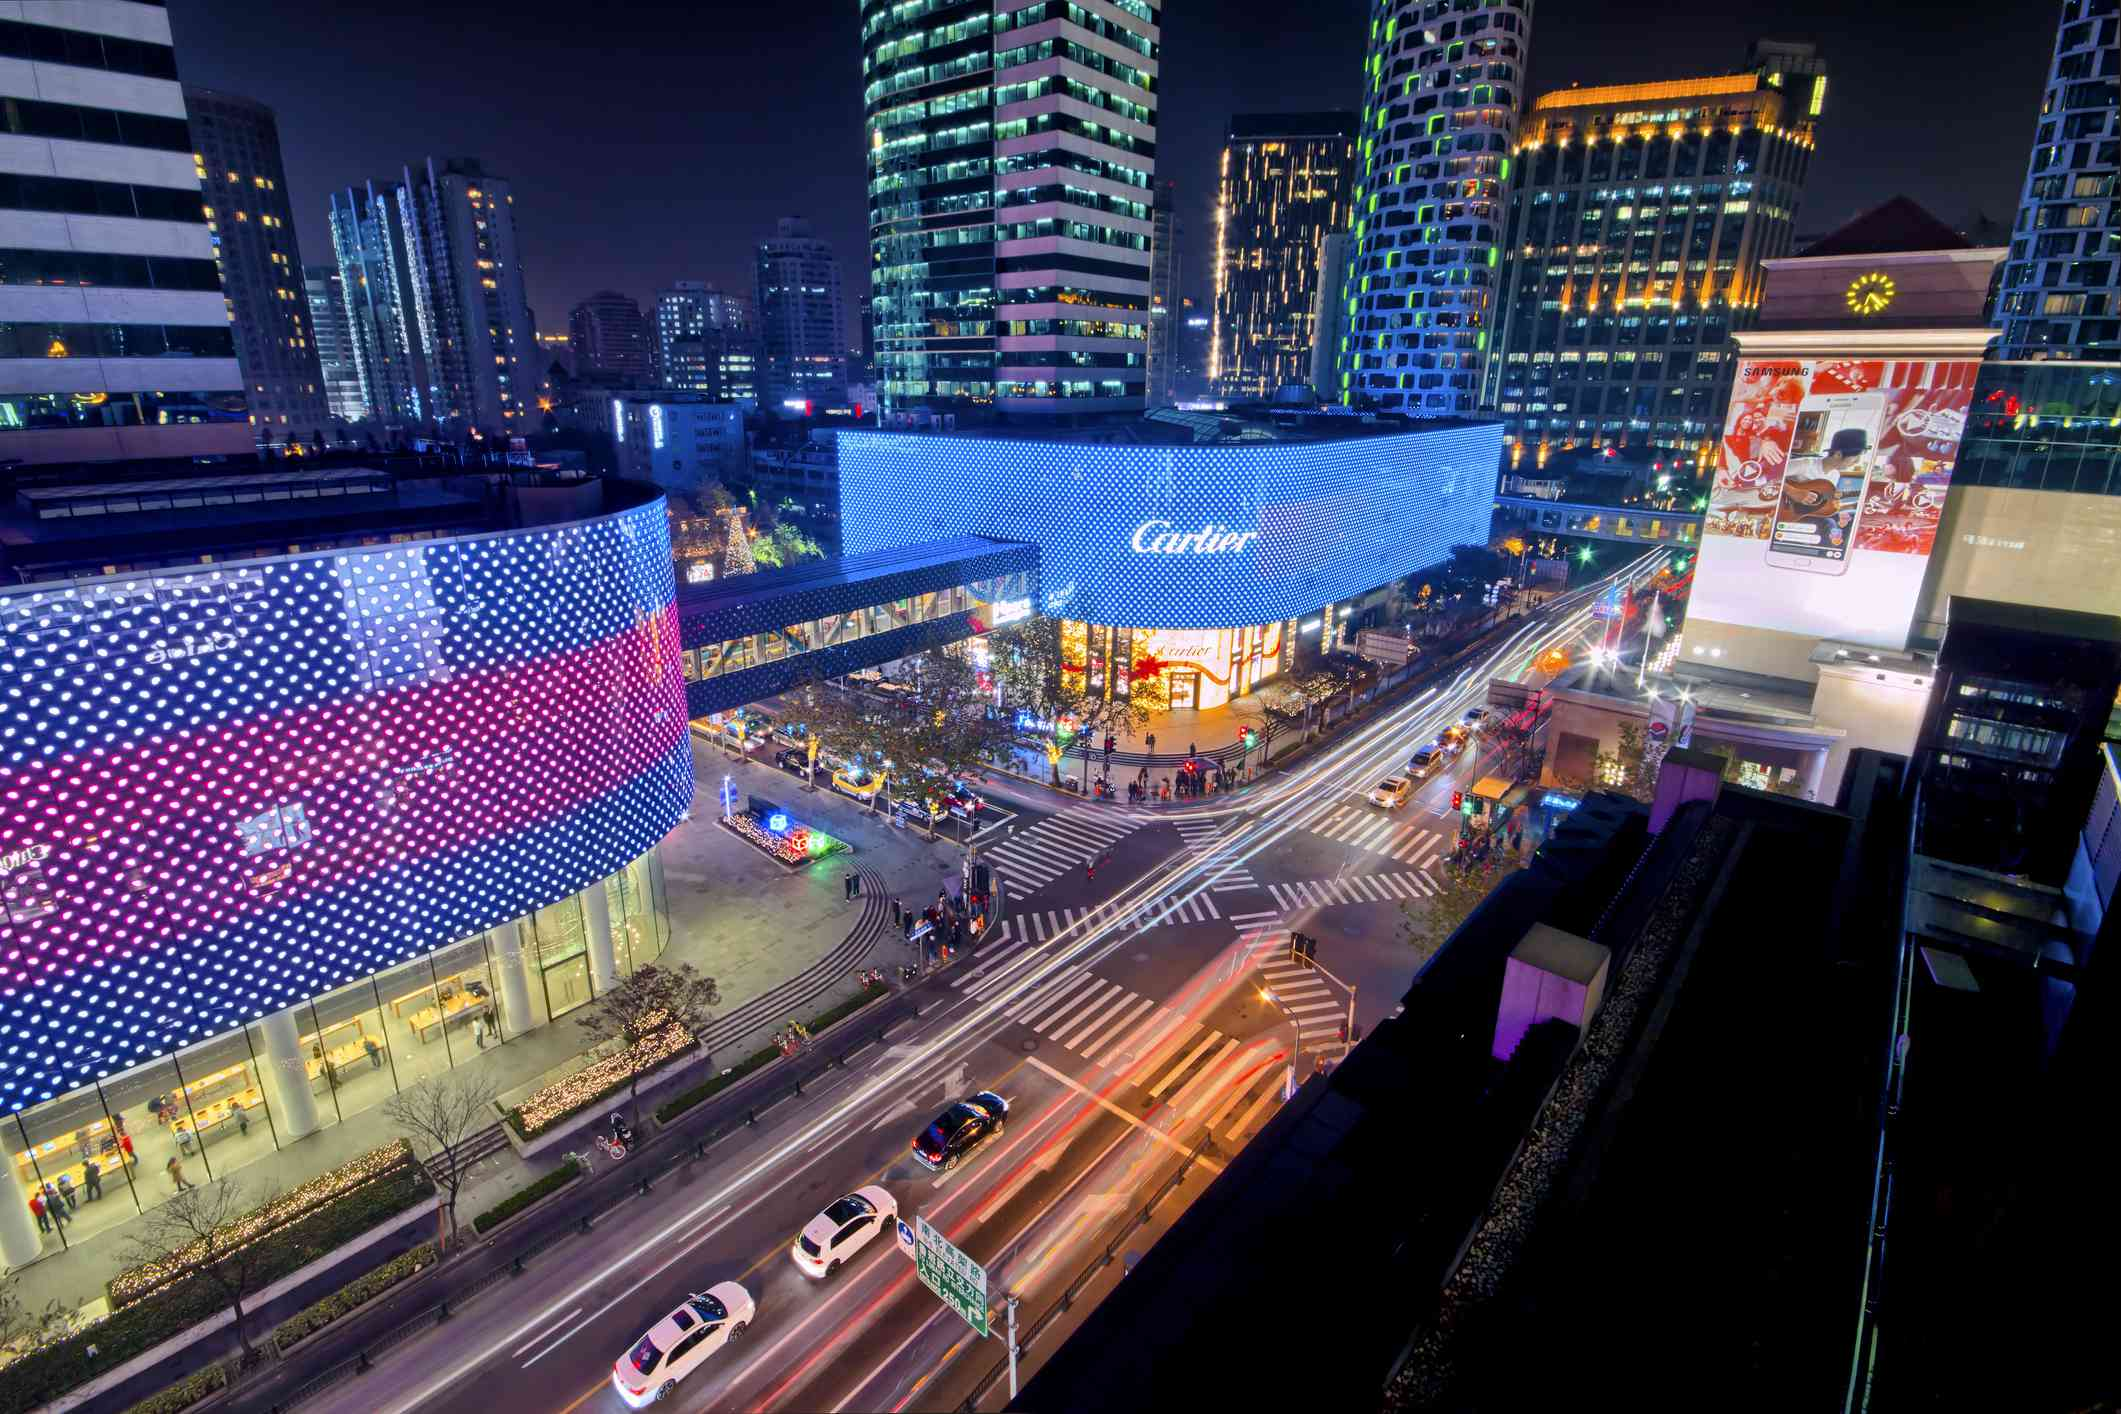 Shanghai Huaihai Road at night